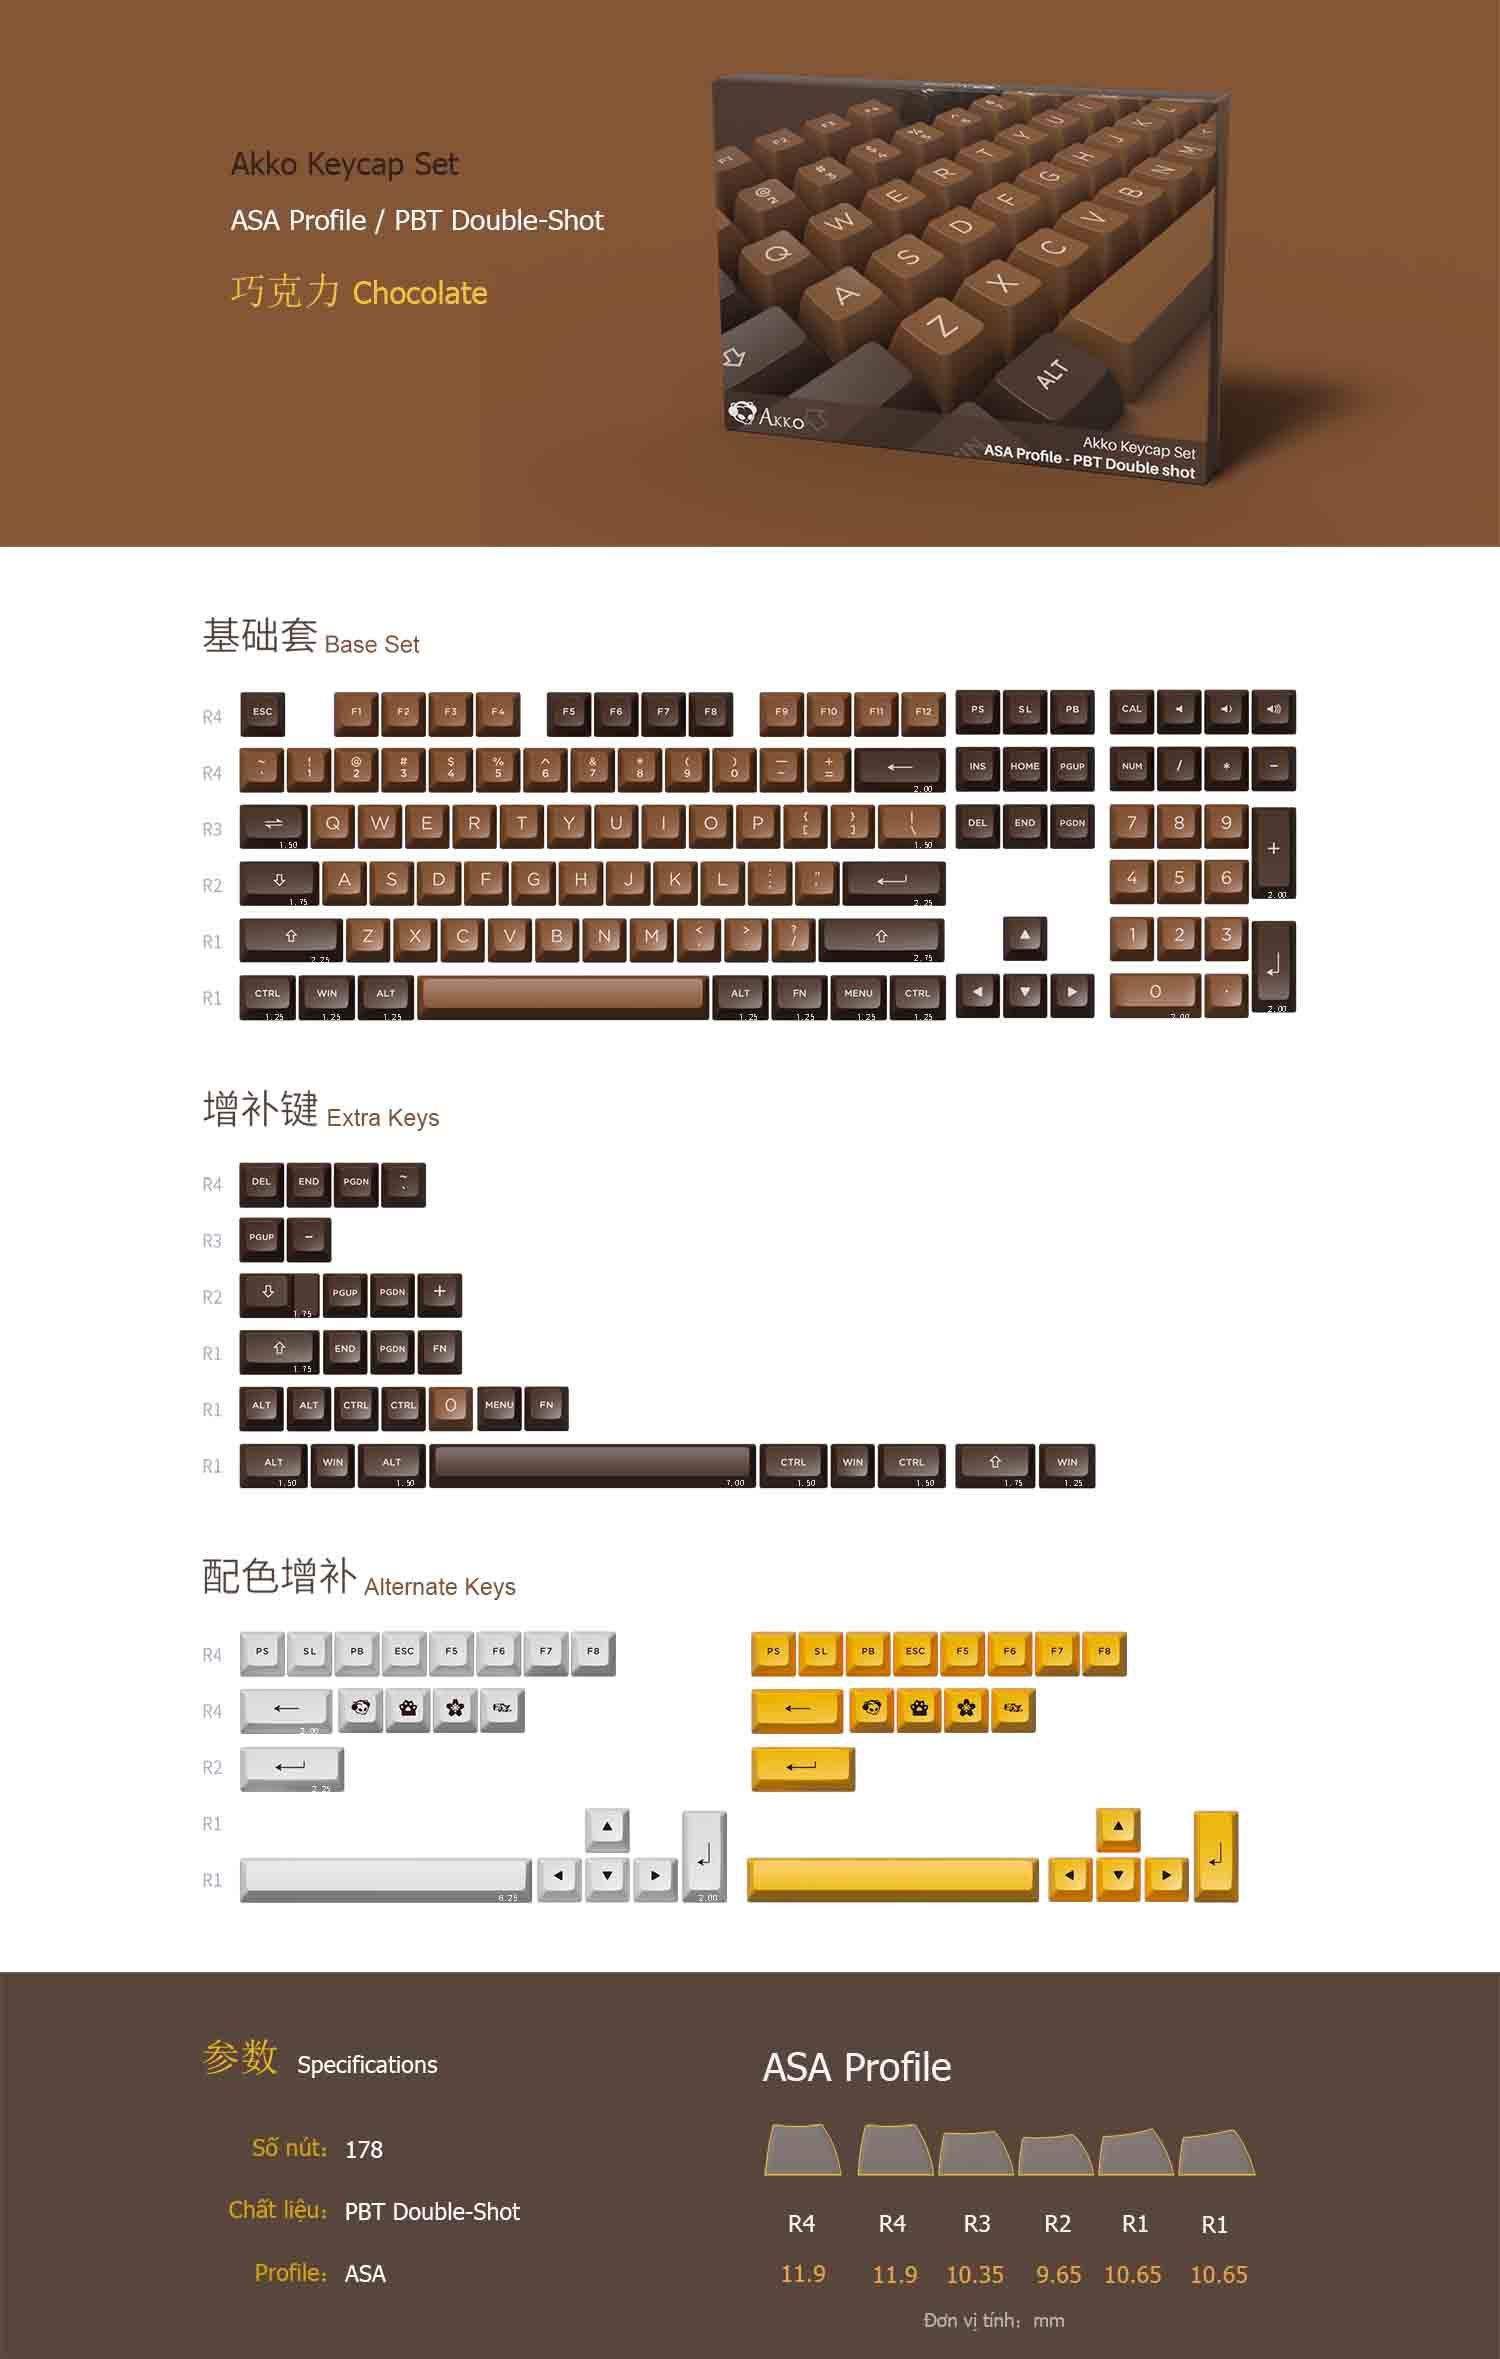 akko-keycap-set-chocolate-pbt-double-shot-asa-178-nut-07